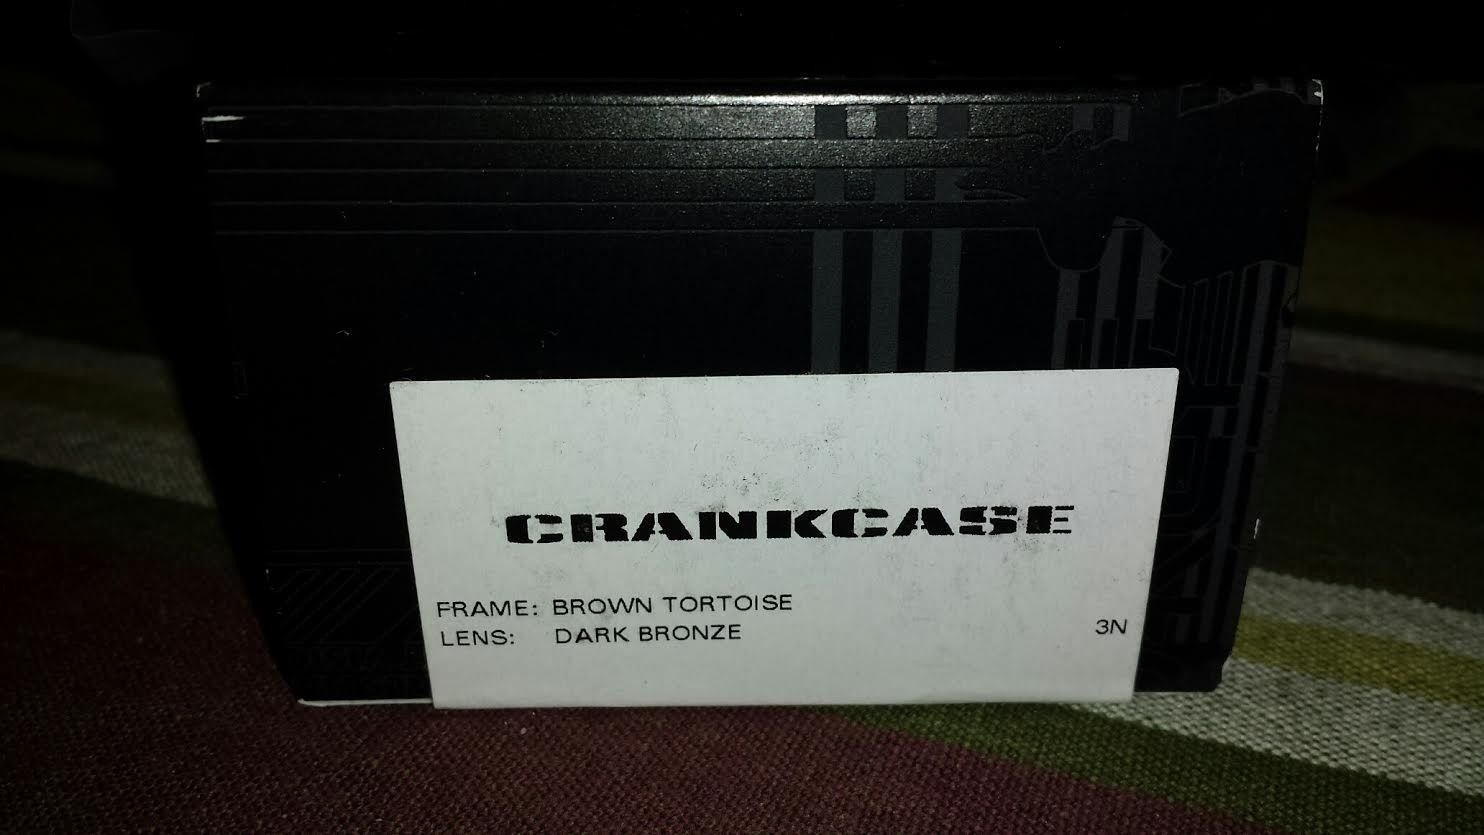 BNIB Crankcase, Dark Bronze Lens, Brown Tortoise Frame - crank3.jpg